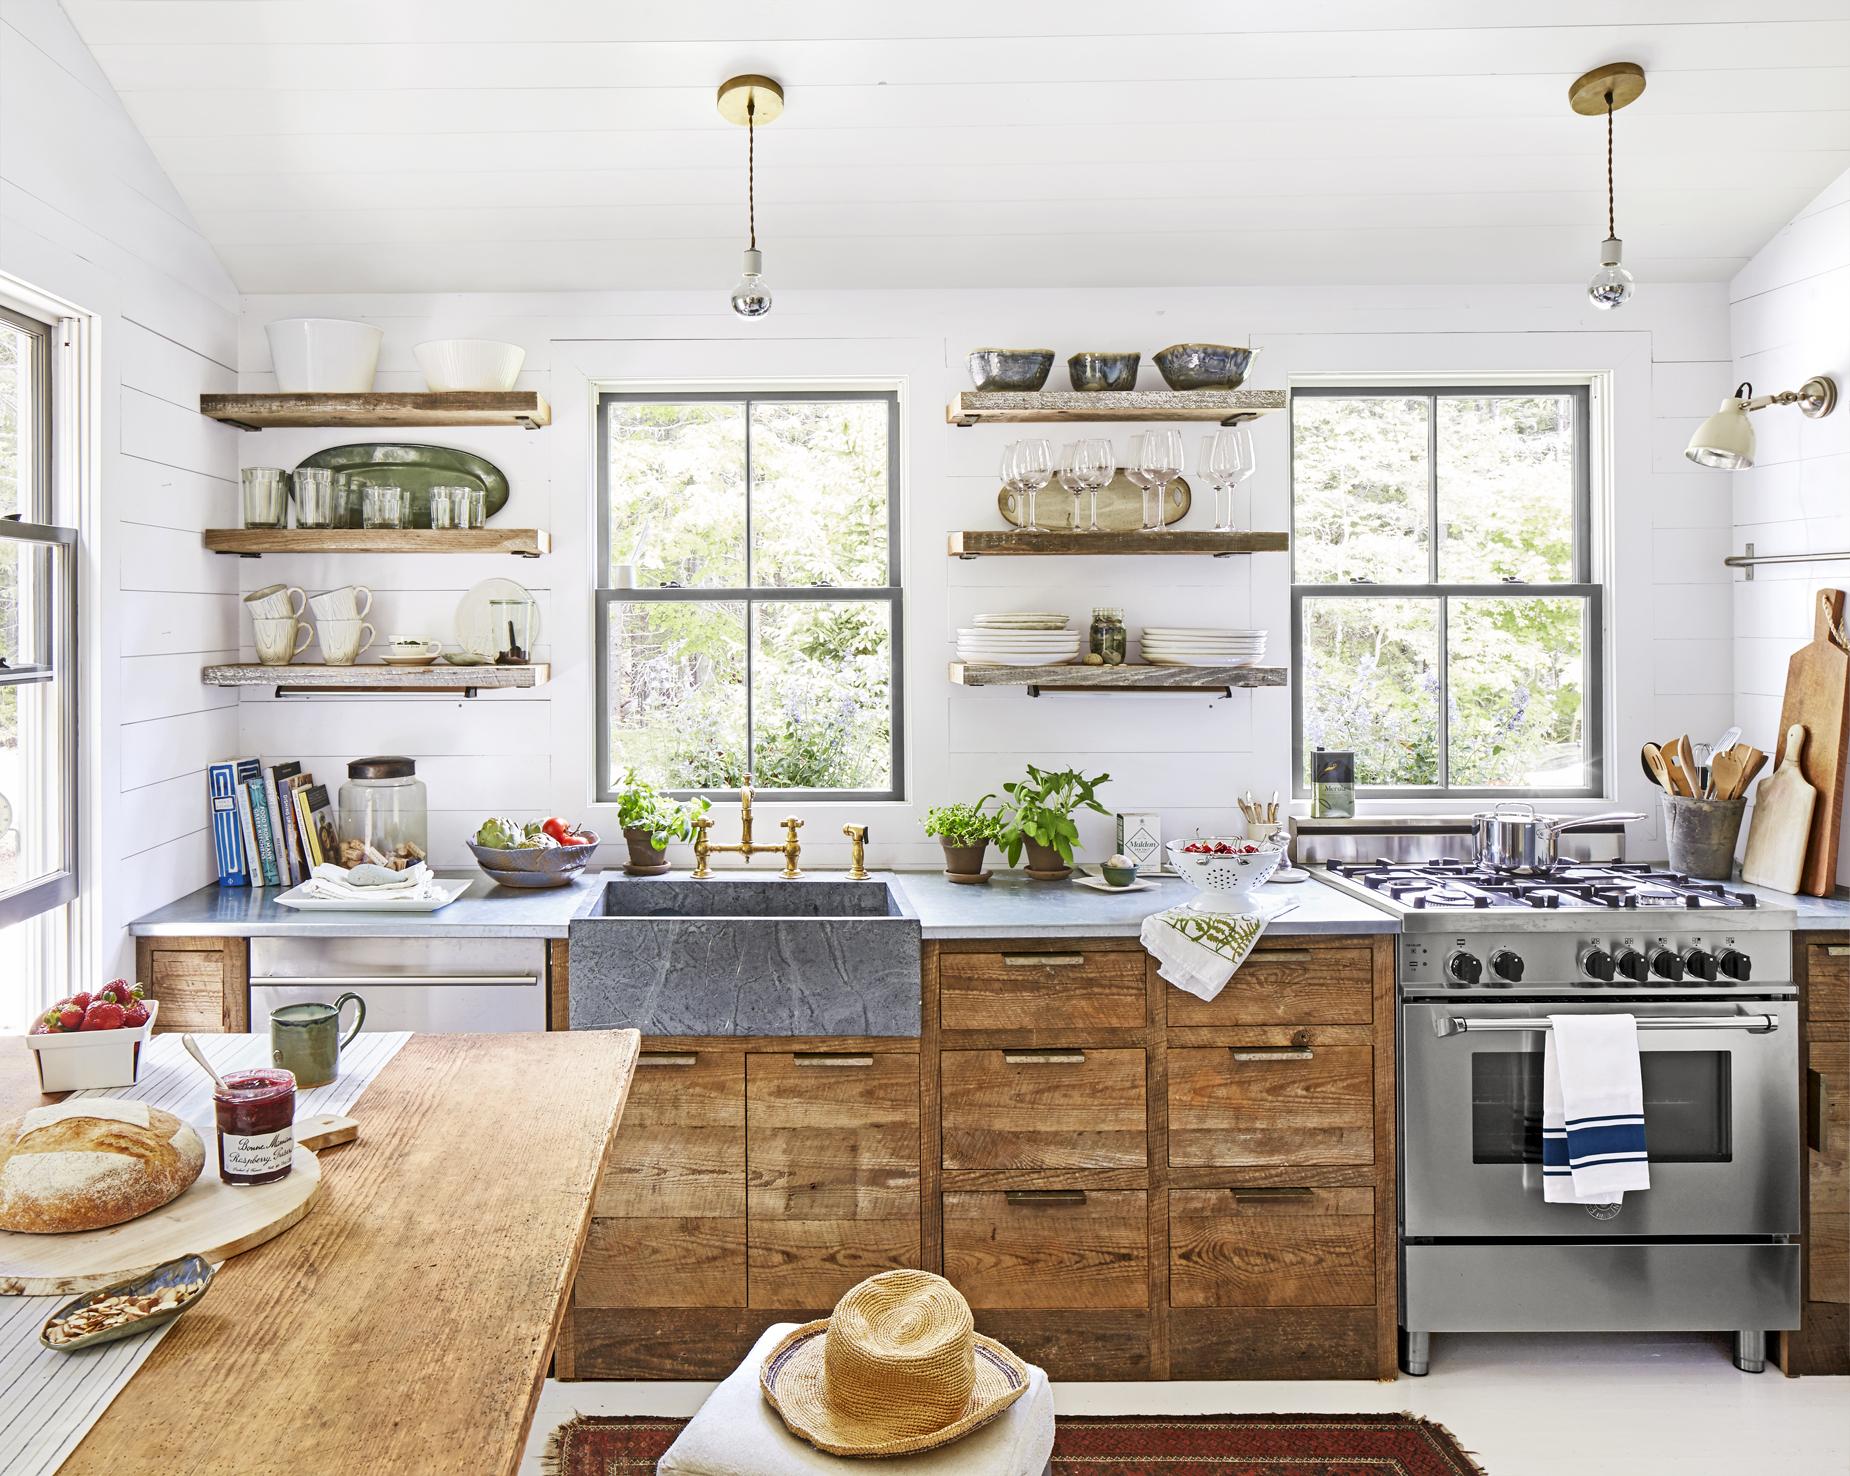 kitchen designs kitchen & bath remodeling Kitchen Design Ideas Pictures of Country Kitchen Decorating Inspiration